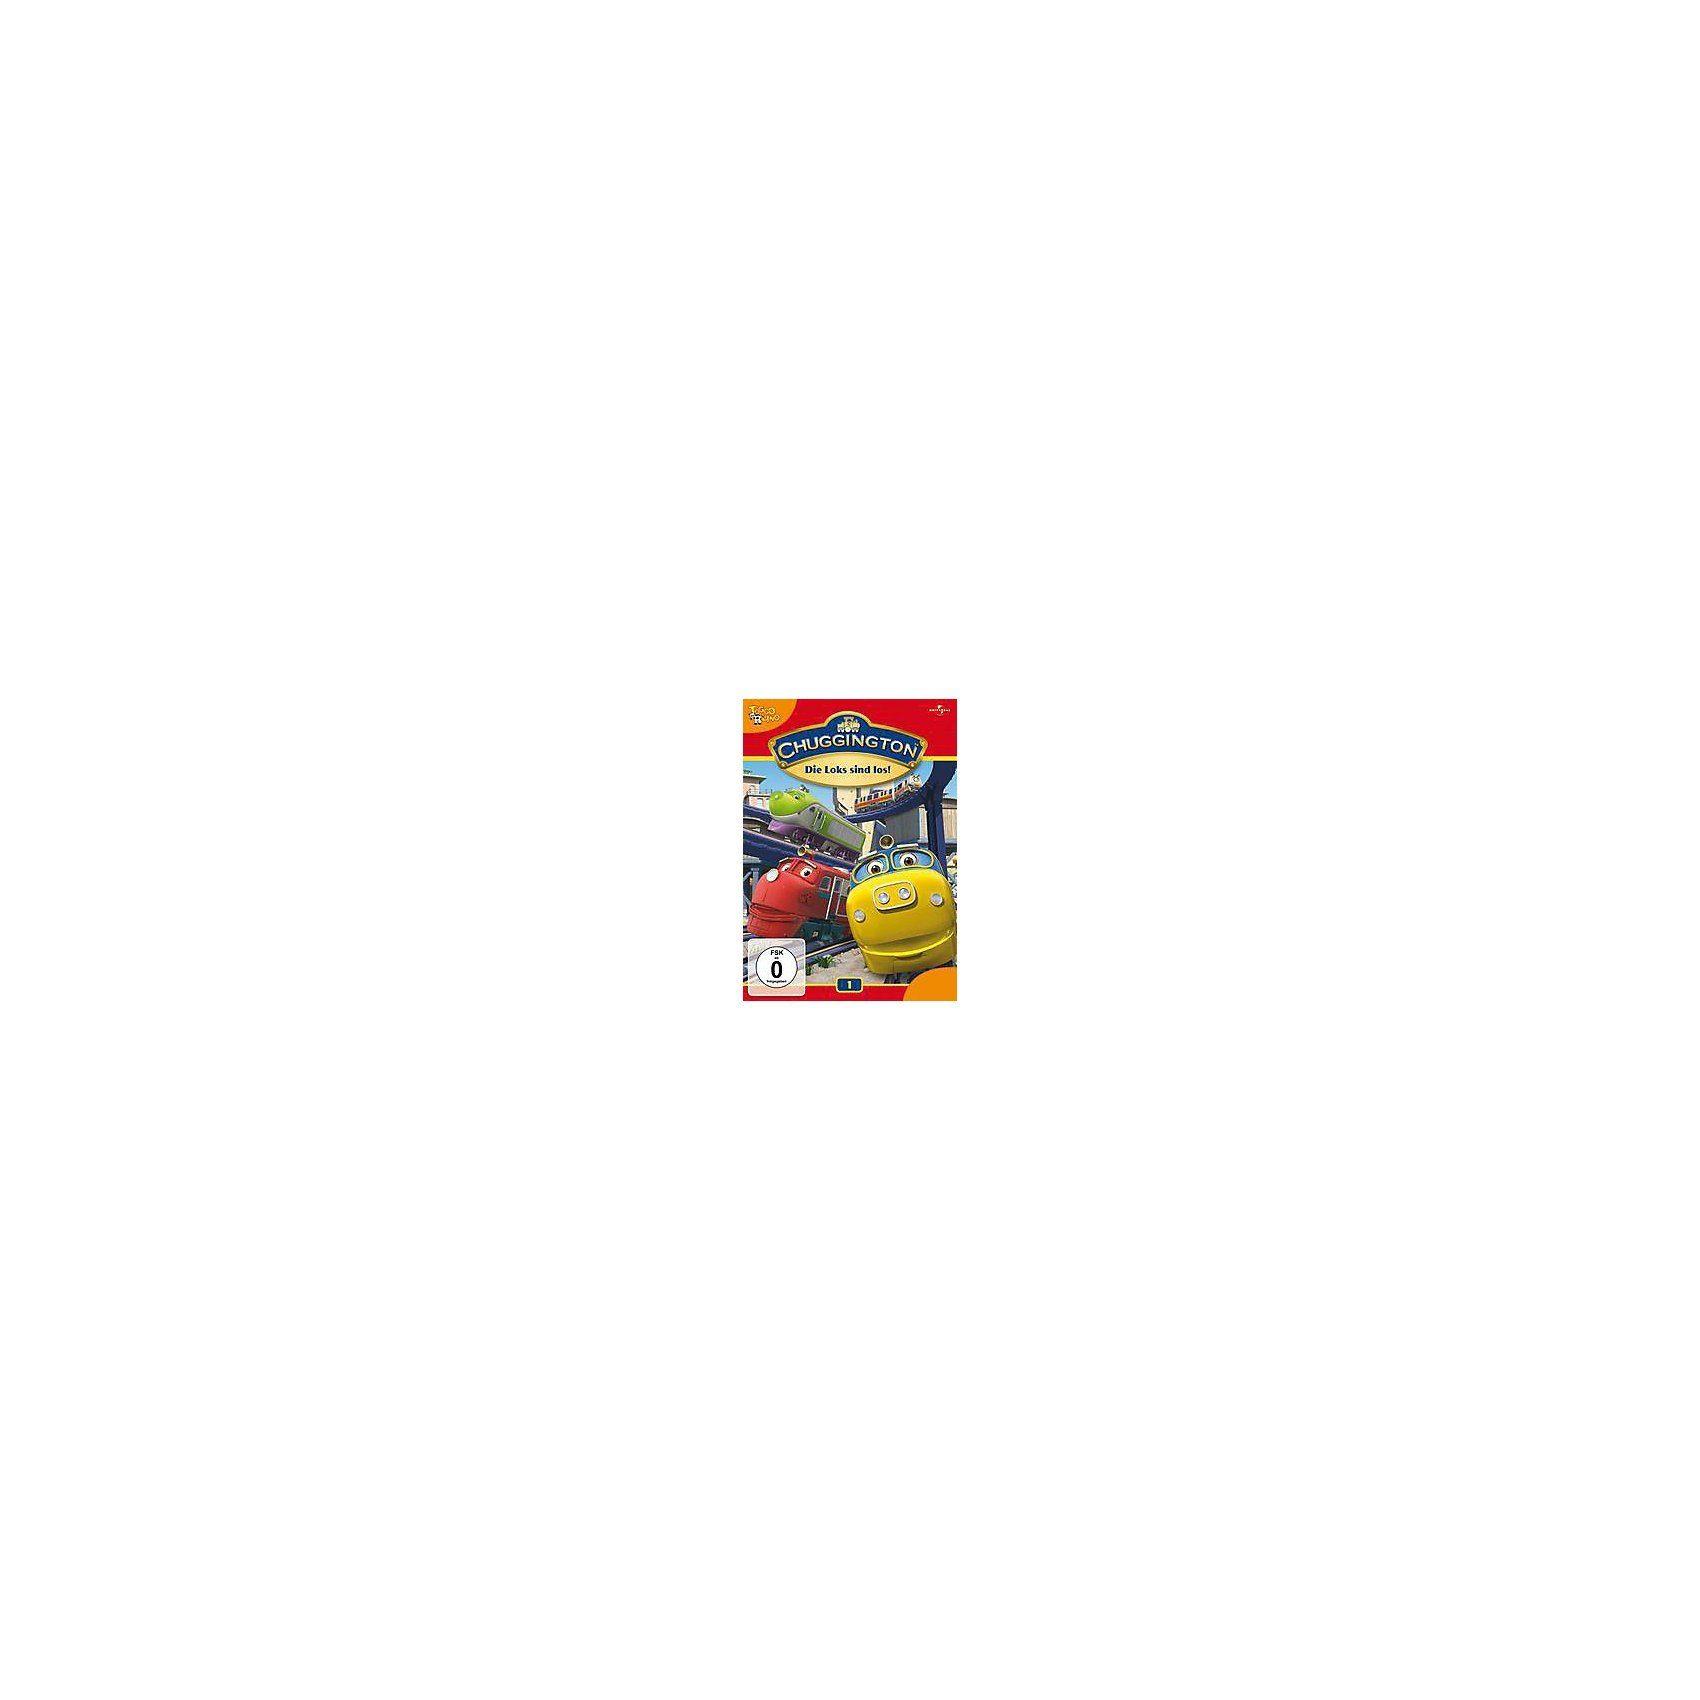 Universal DVD Chuggington 01 - Die Loks sind los